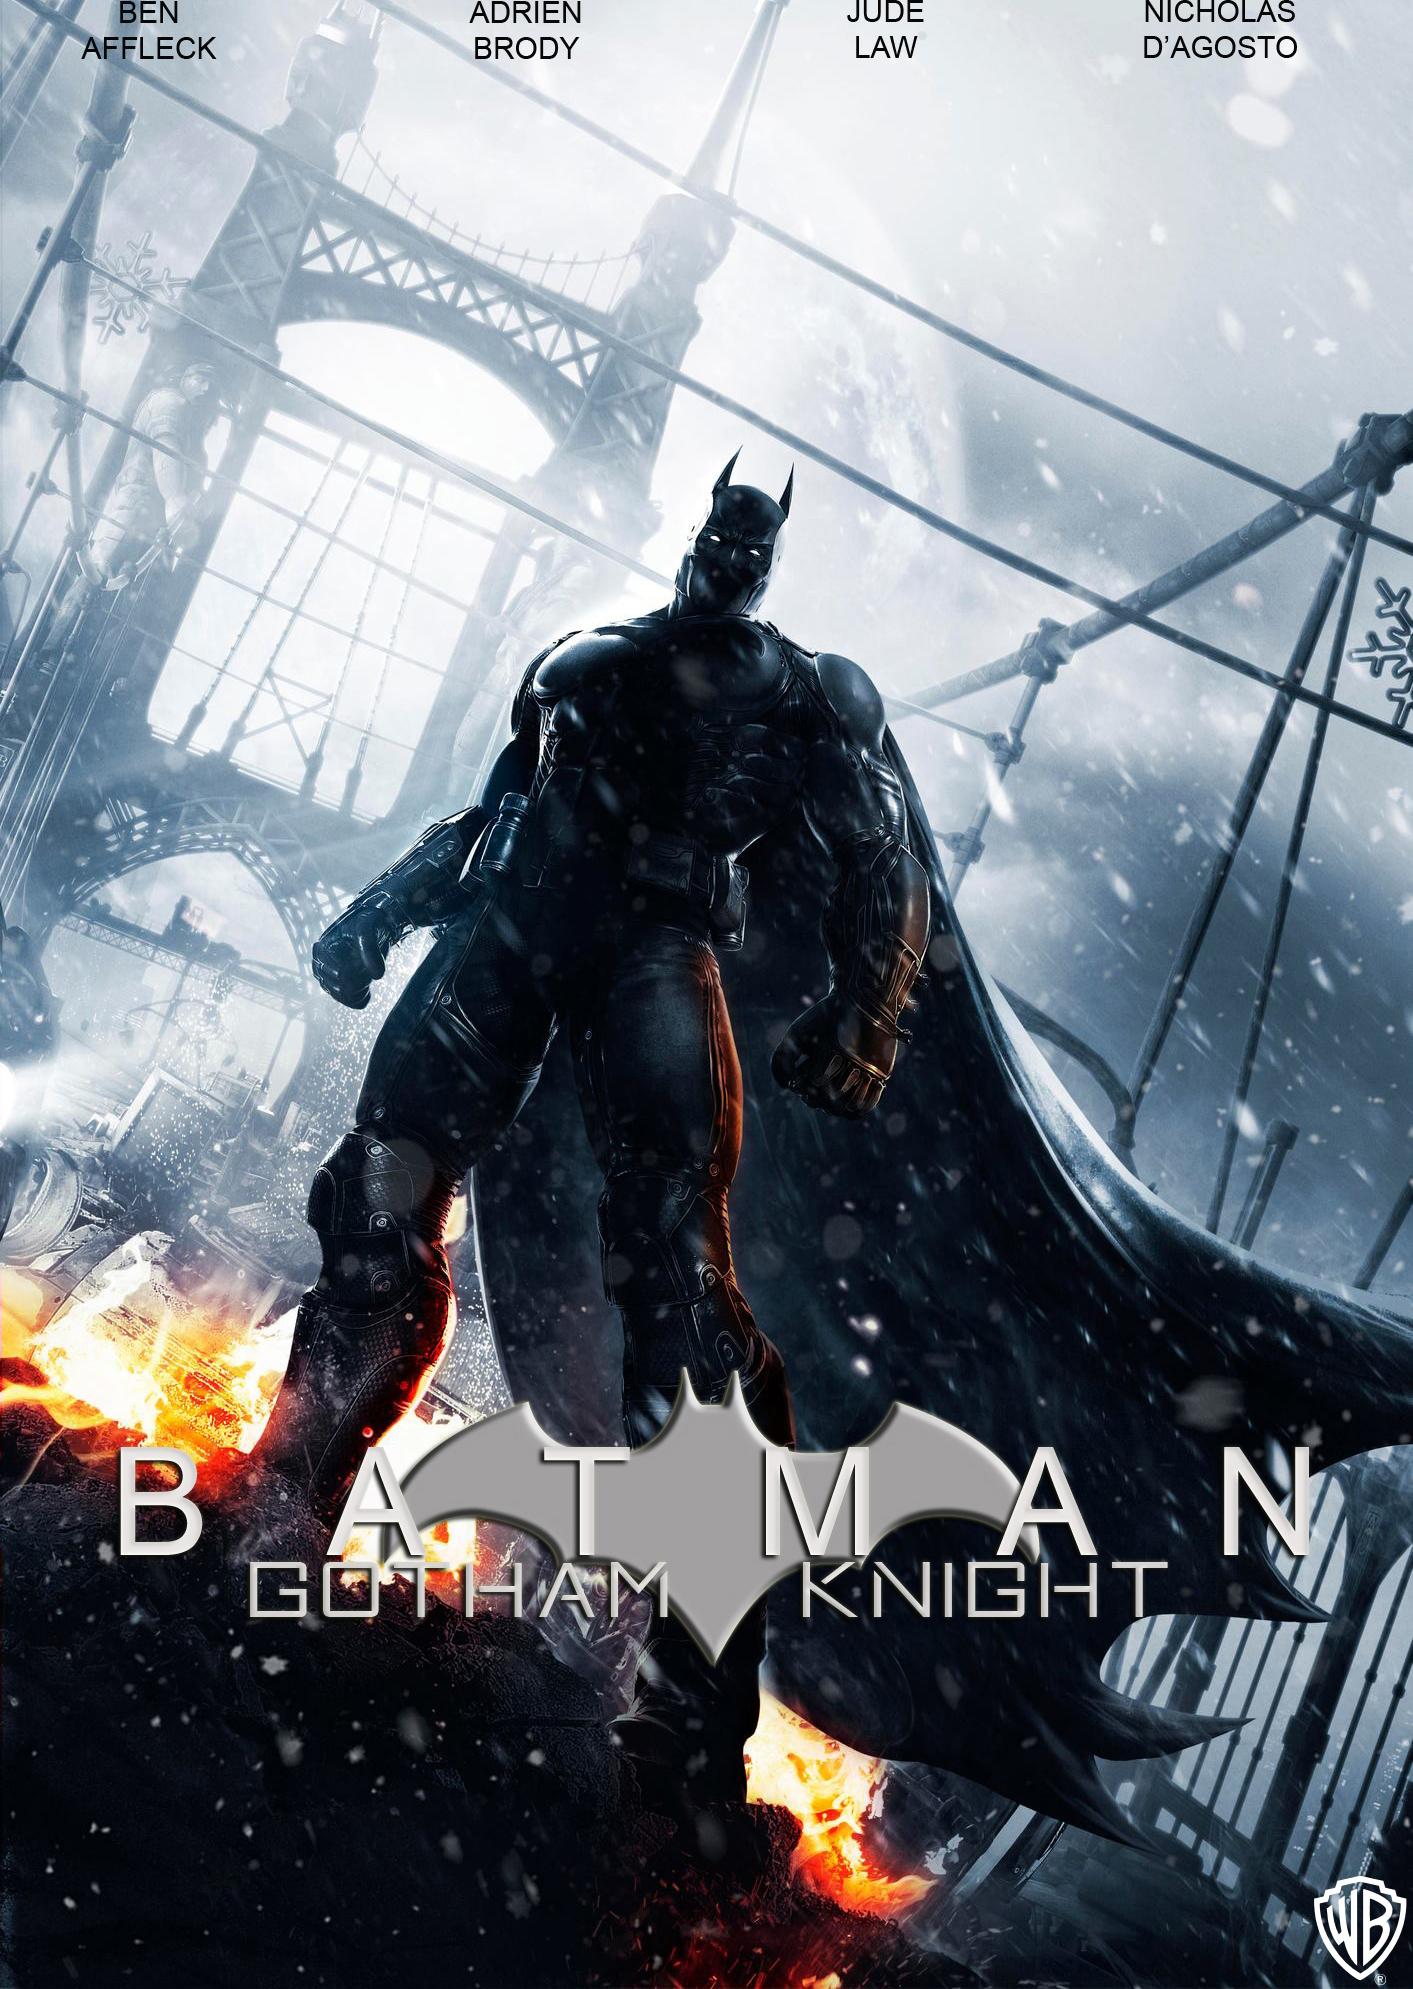 Batman: Gotham Knight ... Adrien Brody Movies List